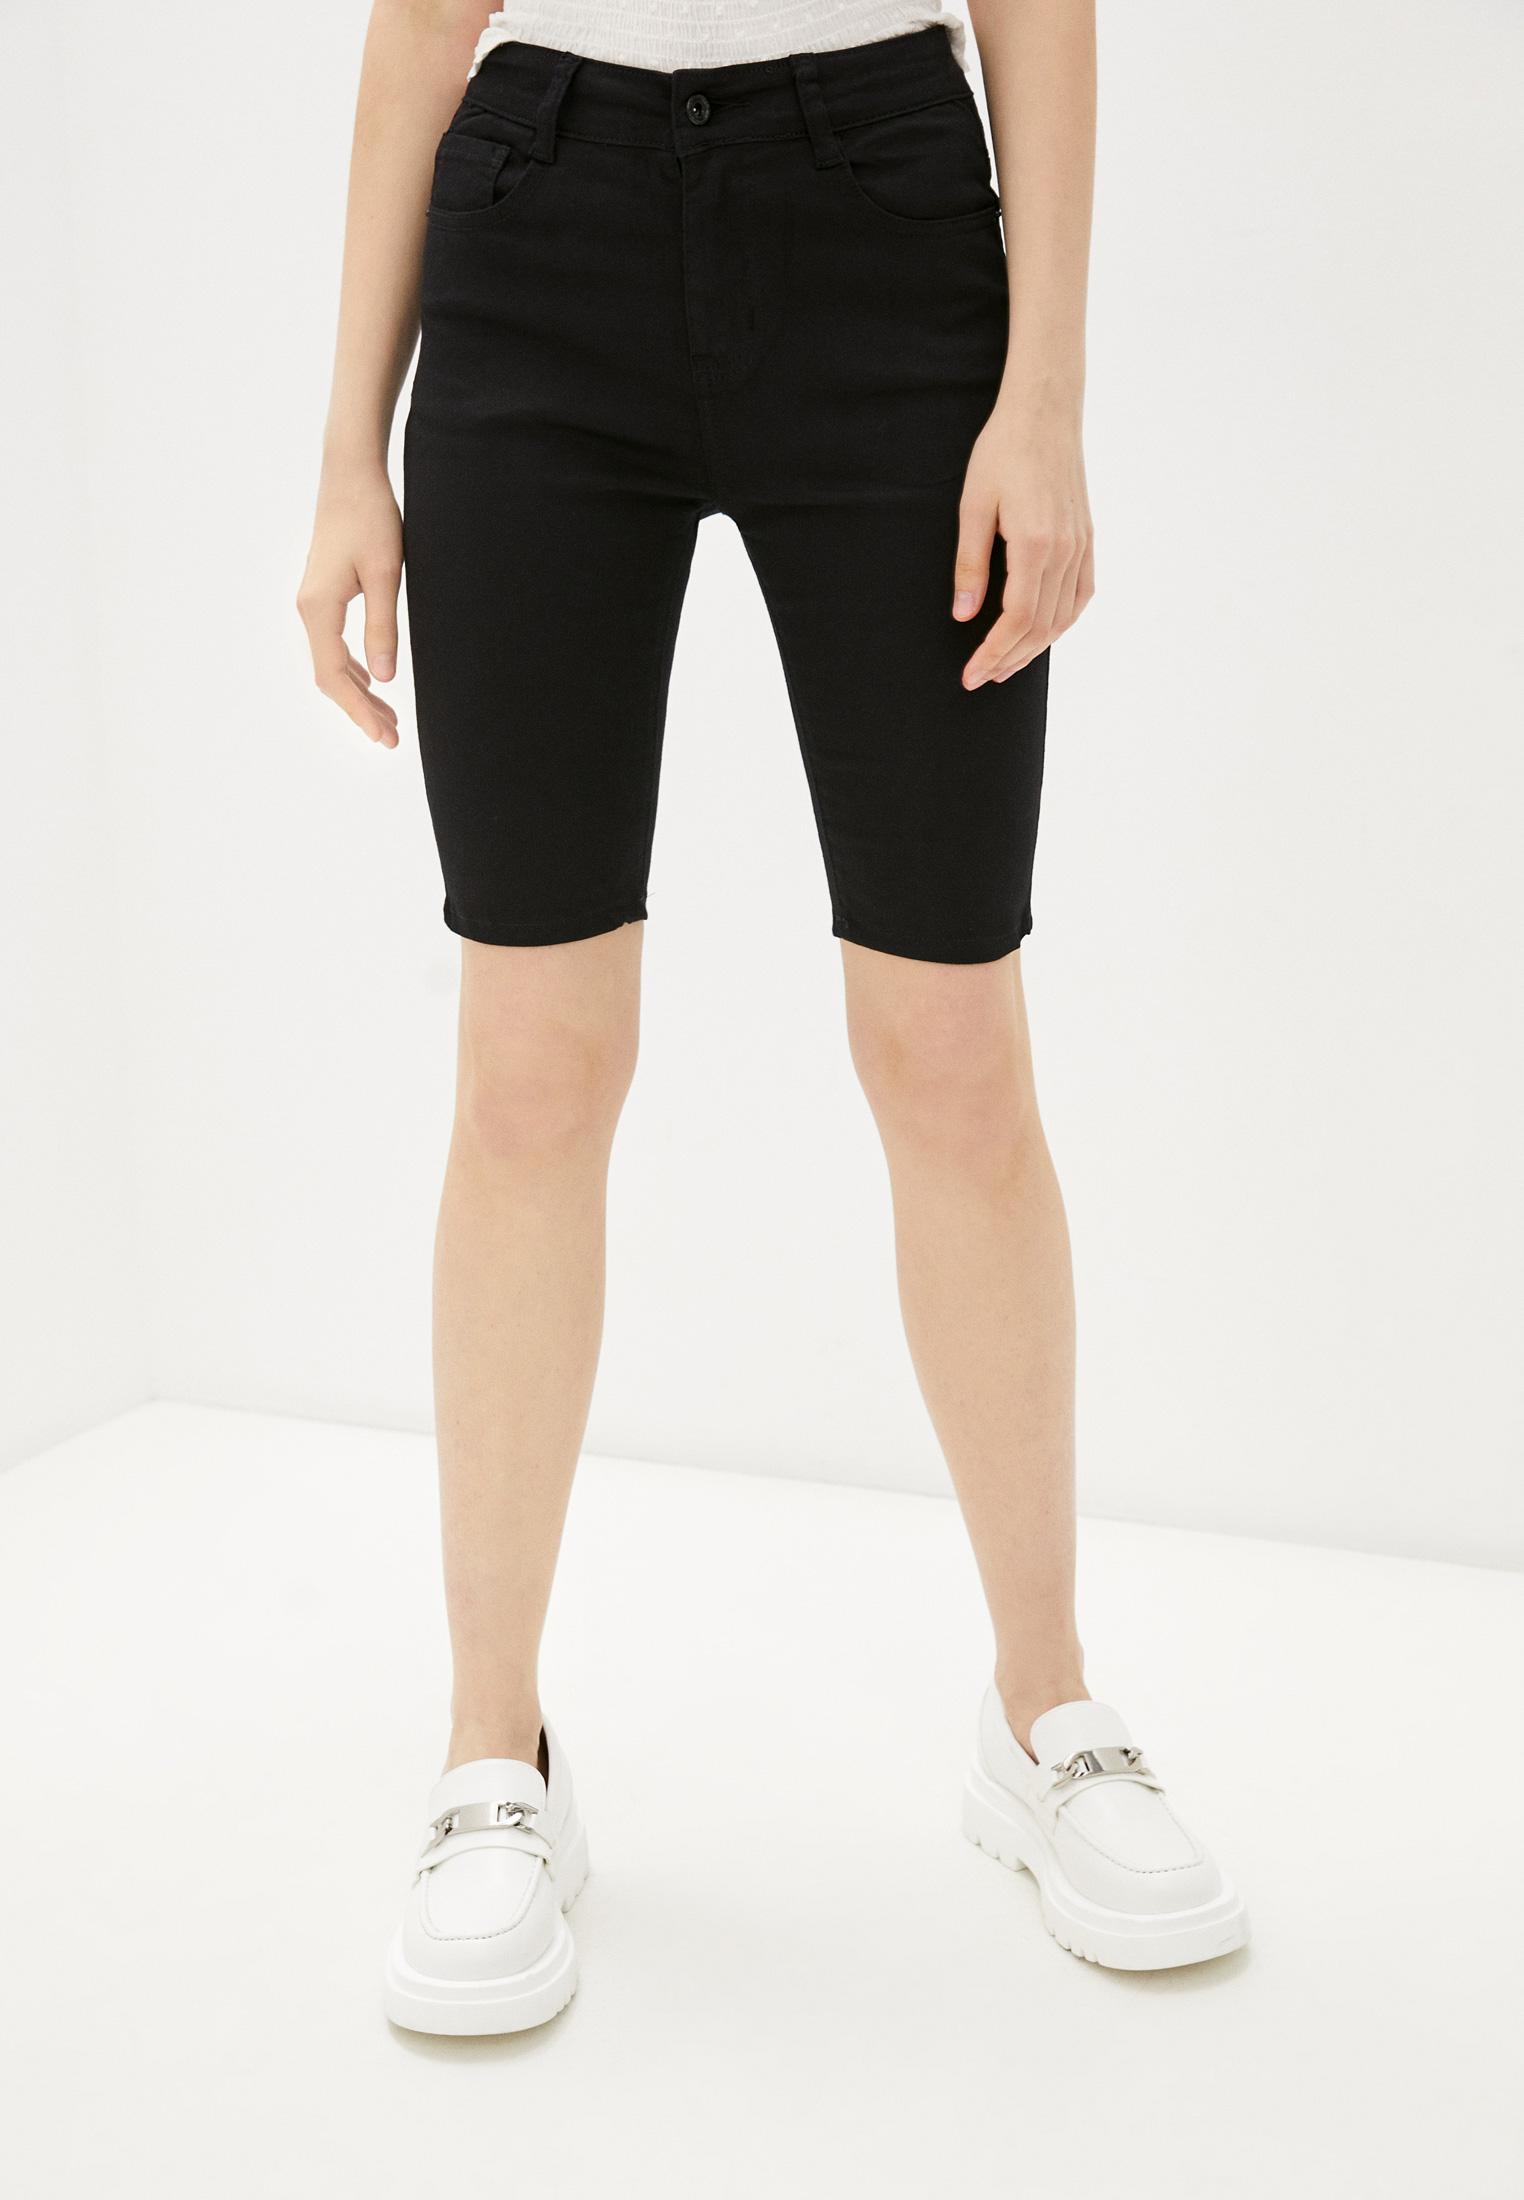 Женские шорты G&G Шорты джинсовые G&G